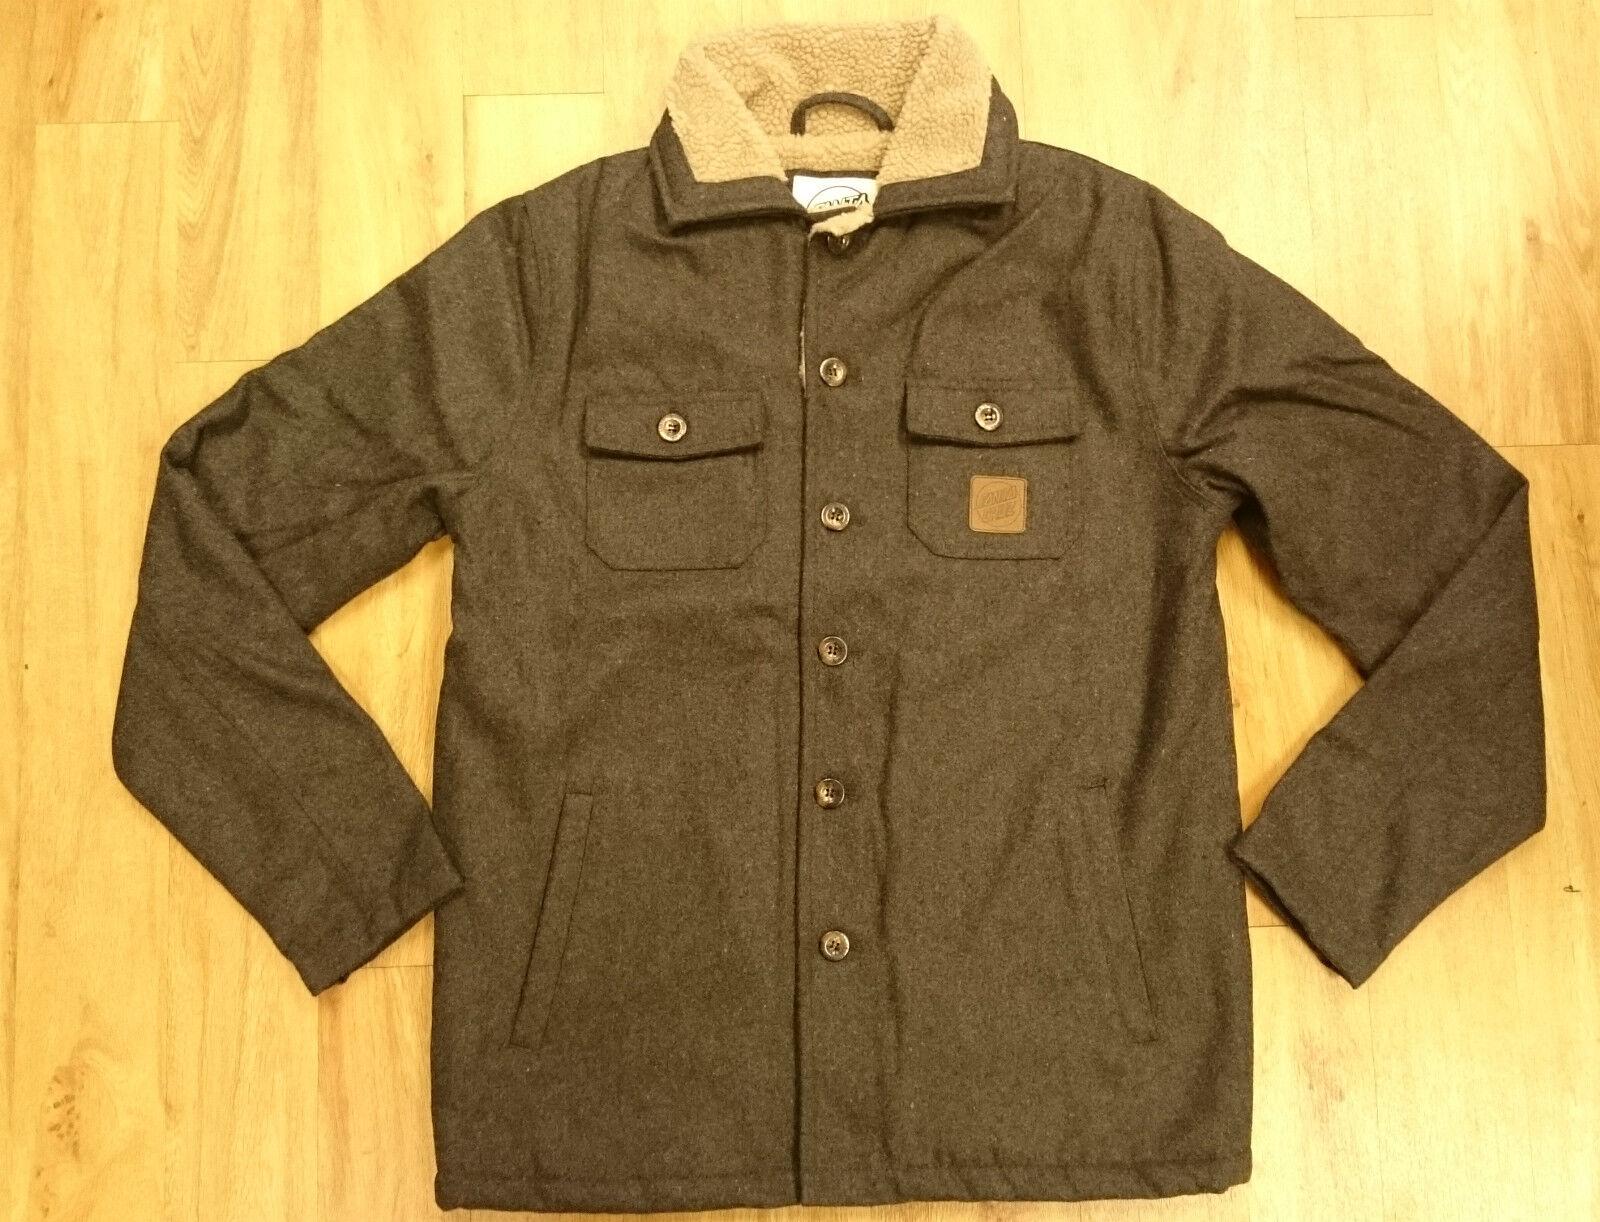 Santa Cruz/ Ranger Coat/ Grau/ Größe Small - 248